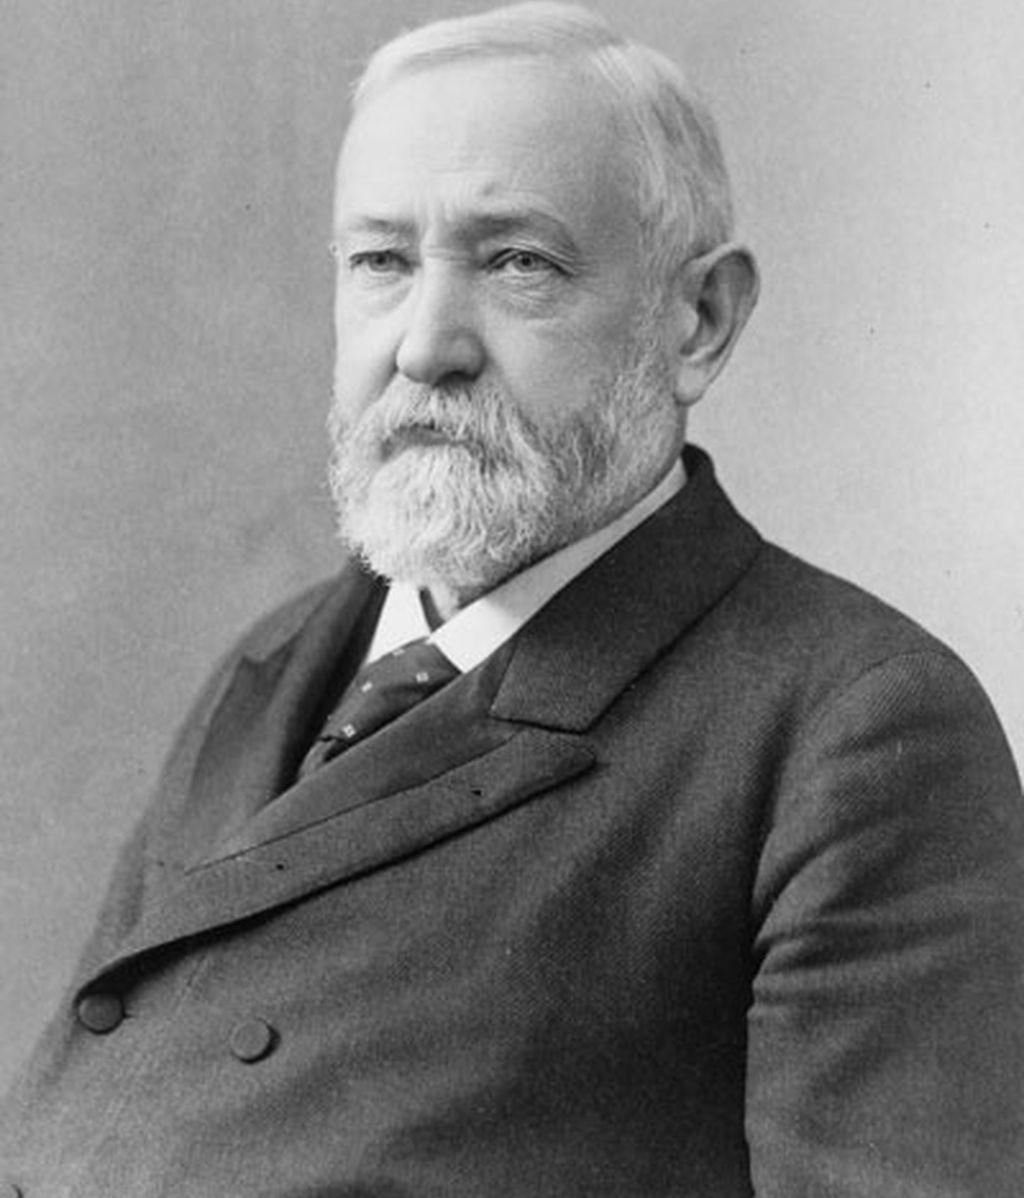 Benjamin Harrison (1889-1893)